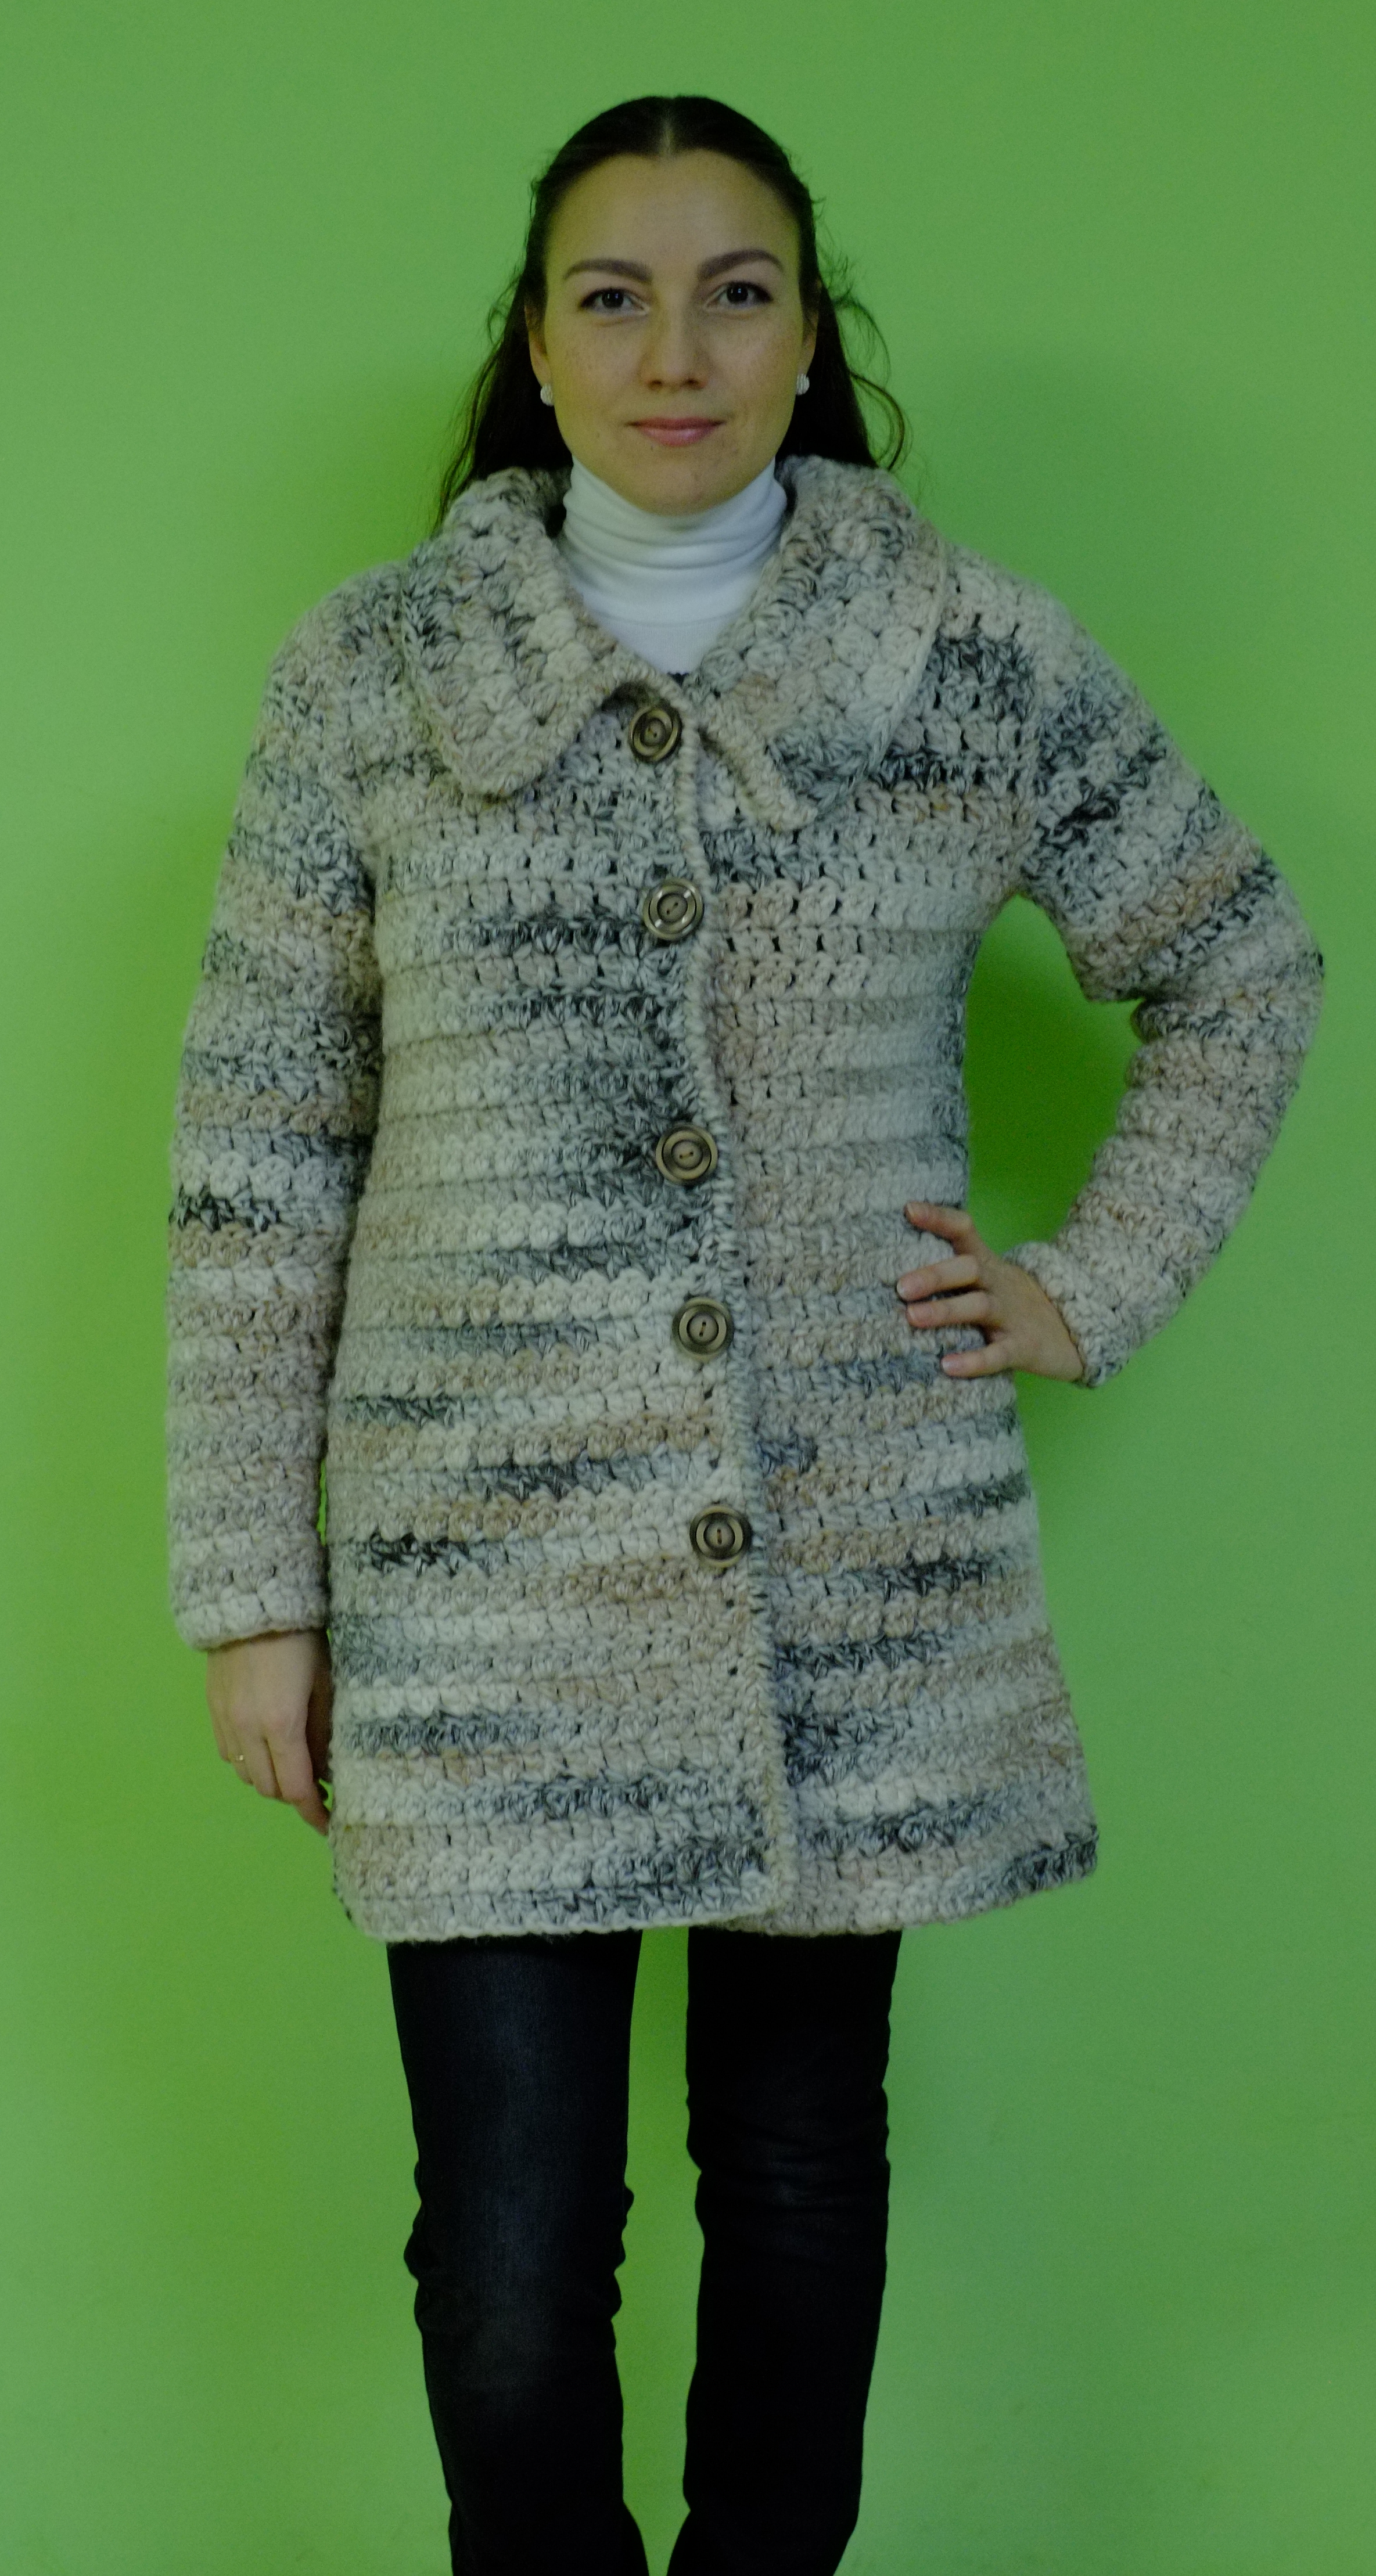 Пальто вязанное крючком осеннее фото